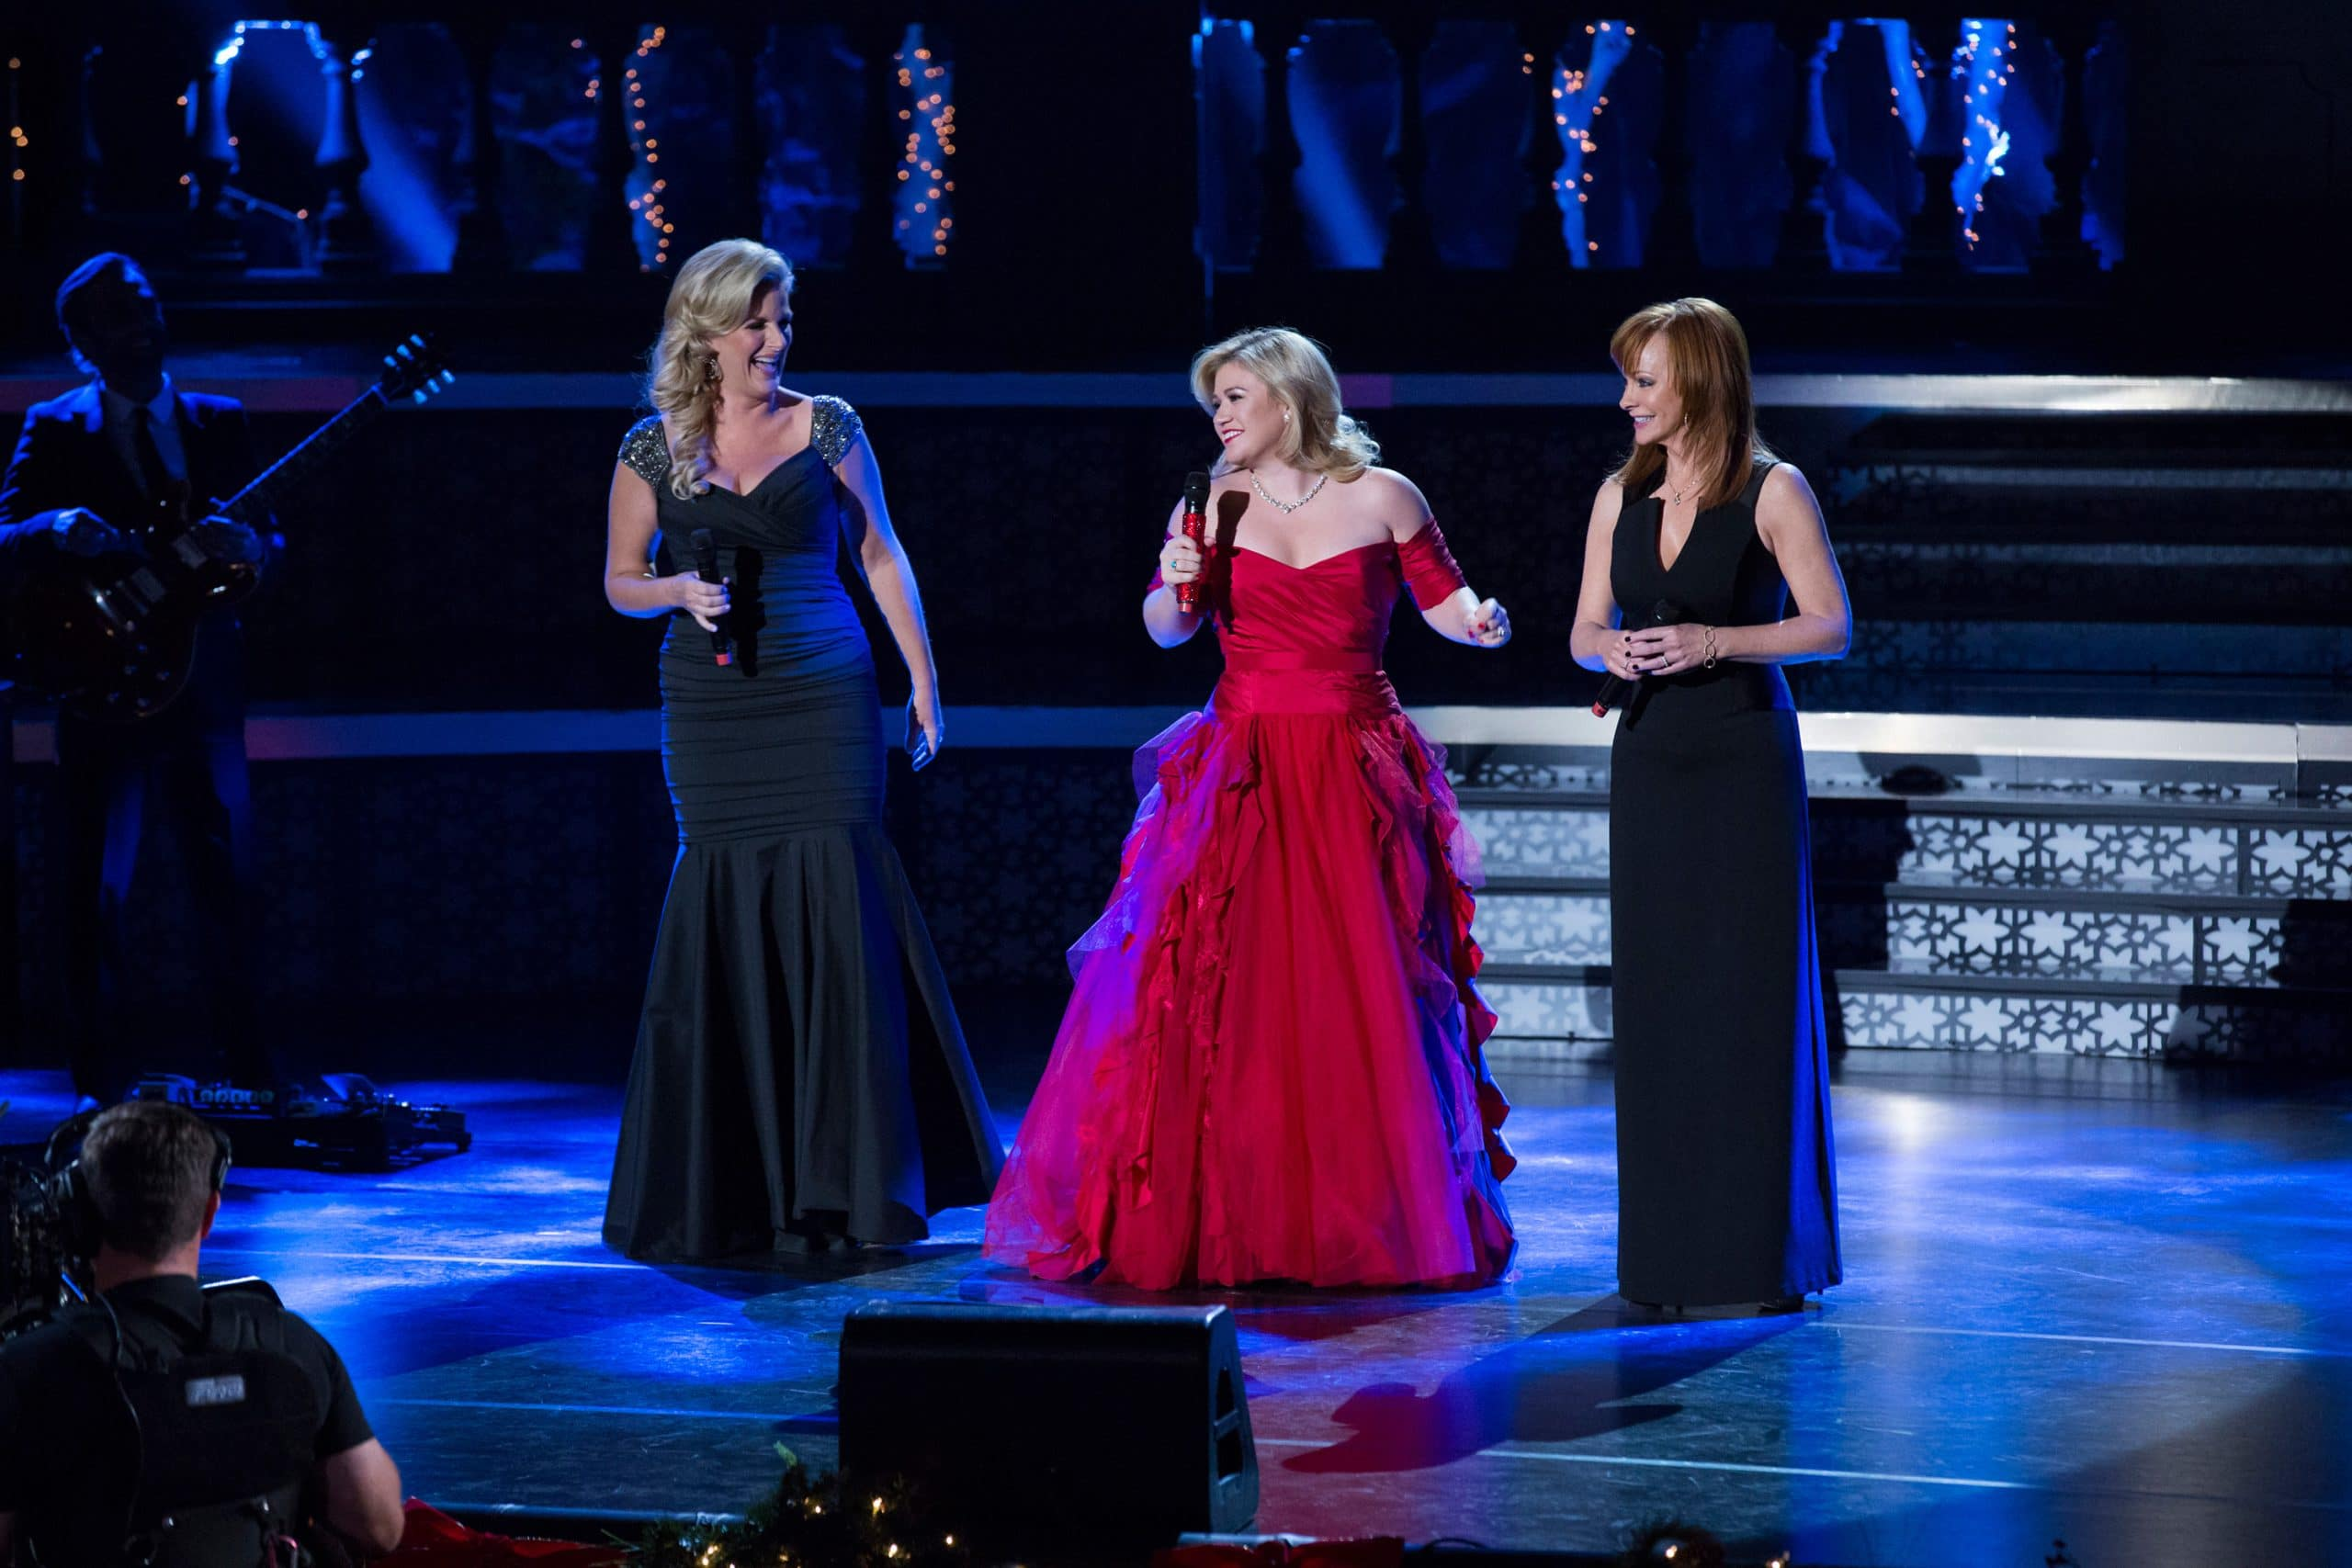 KELLY CLARKSON'S CAUTIONARY CHRISTMAS MUSIC TALE, (from left): Trisha Yearwood, Kelly Clarkson, Reba McEntire